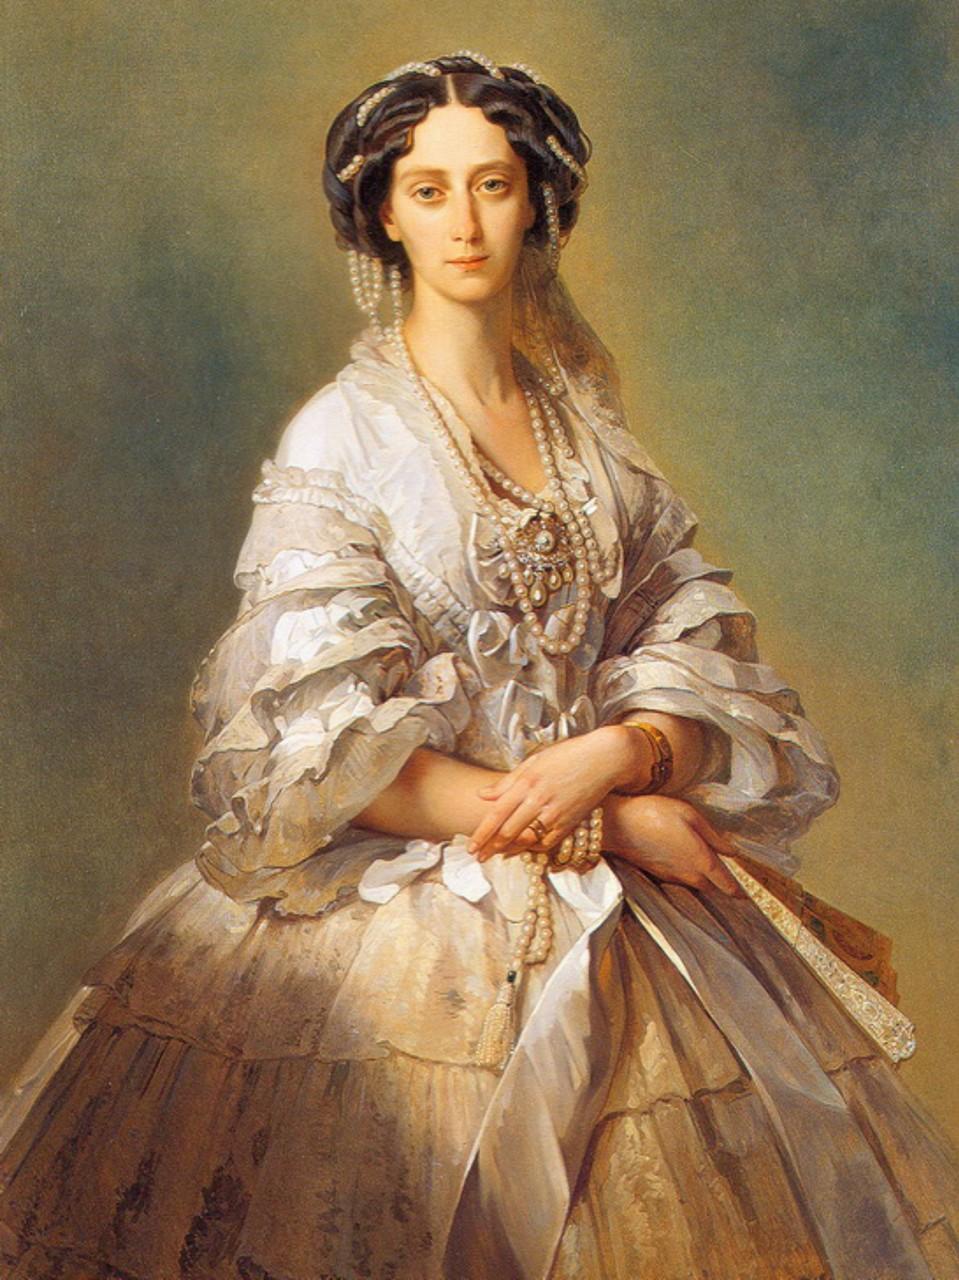 Мария Александровна, Императрица, урожденная Принцесса Гессен-Дармштадтская